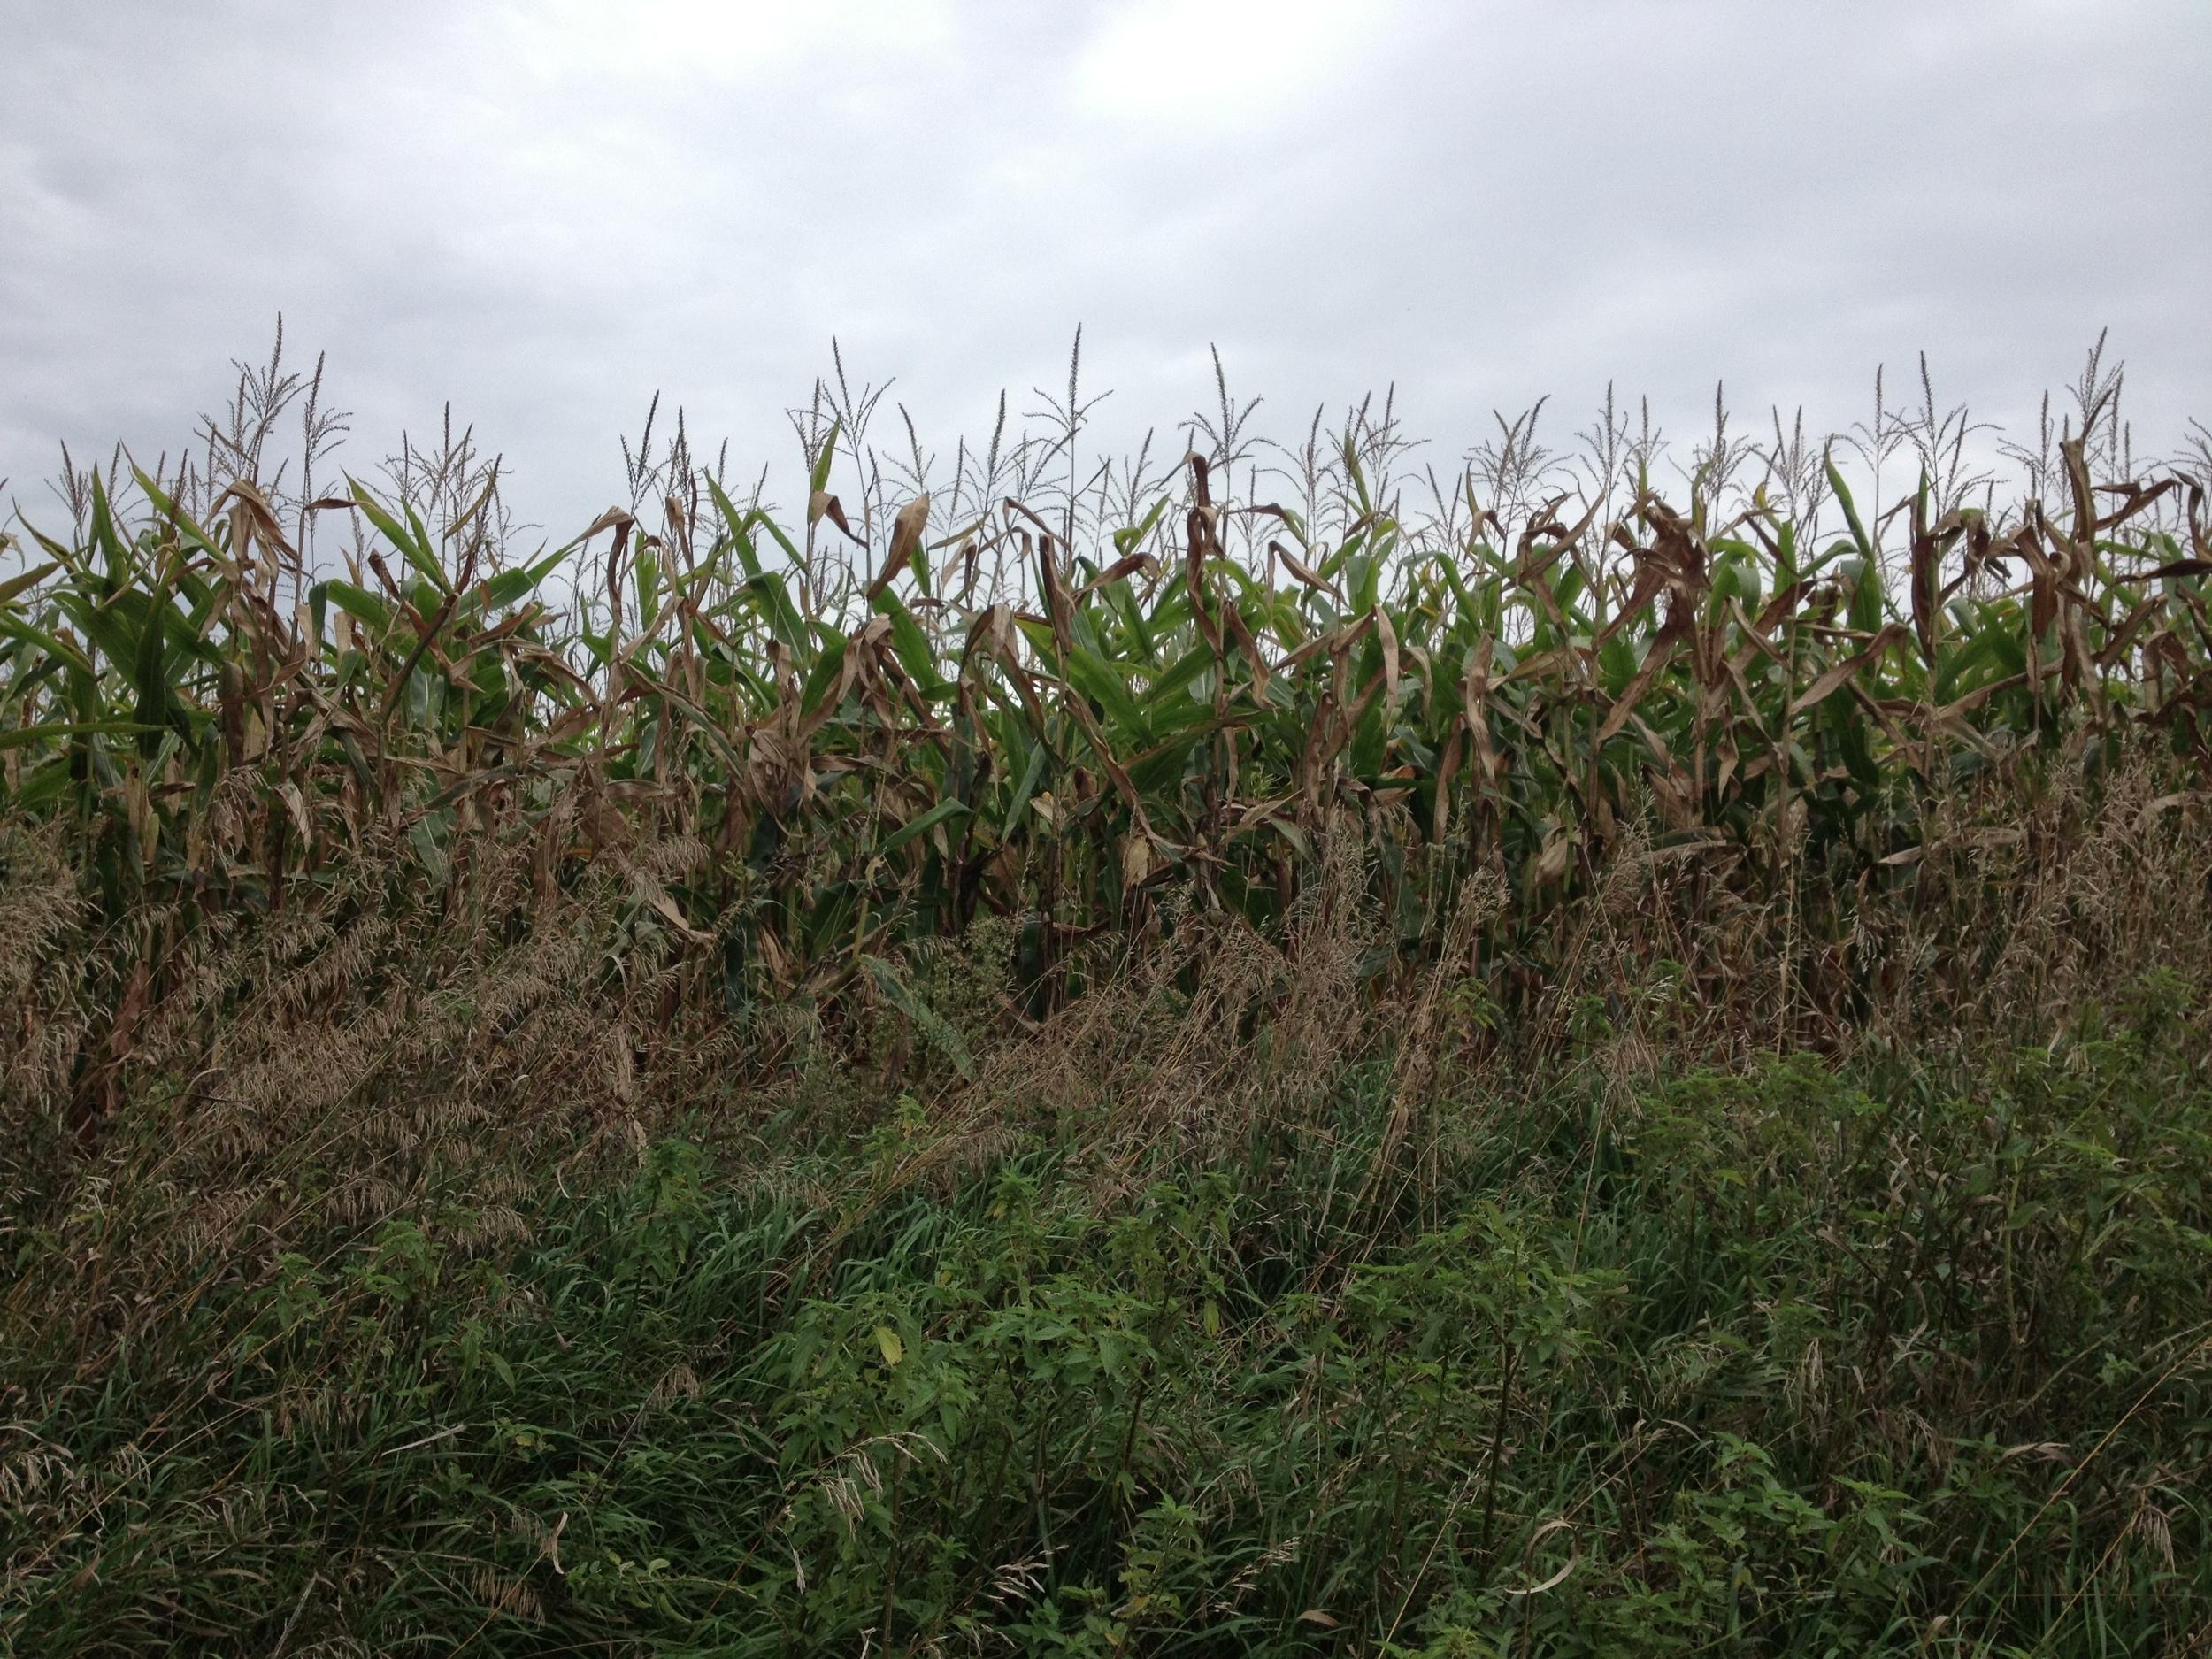 Corn at Kilen Woods State Park